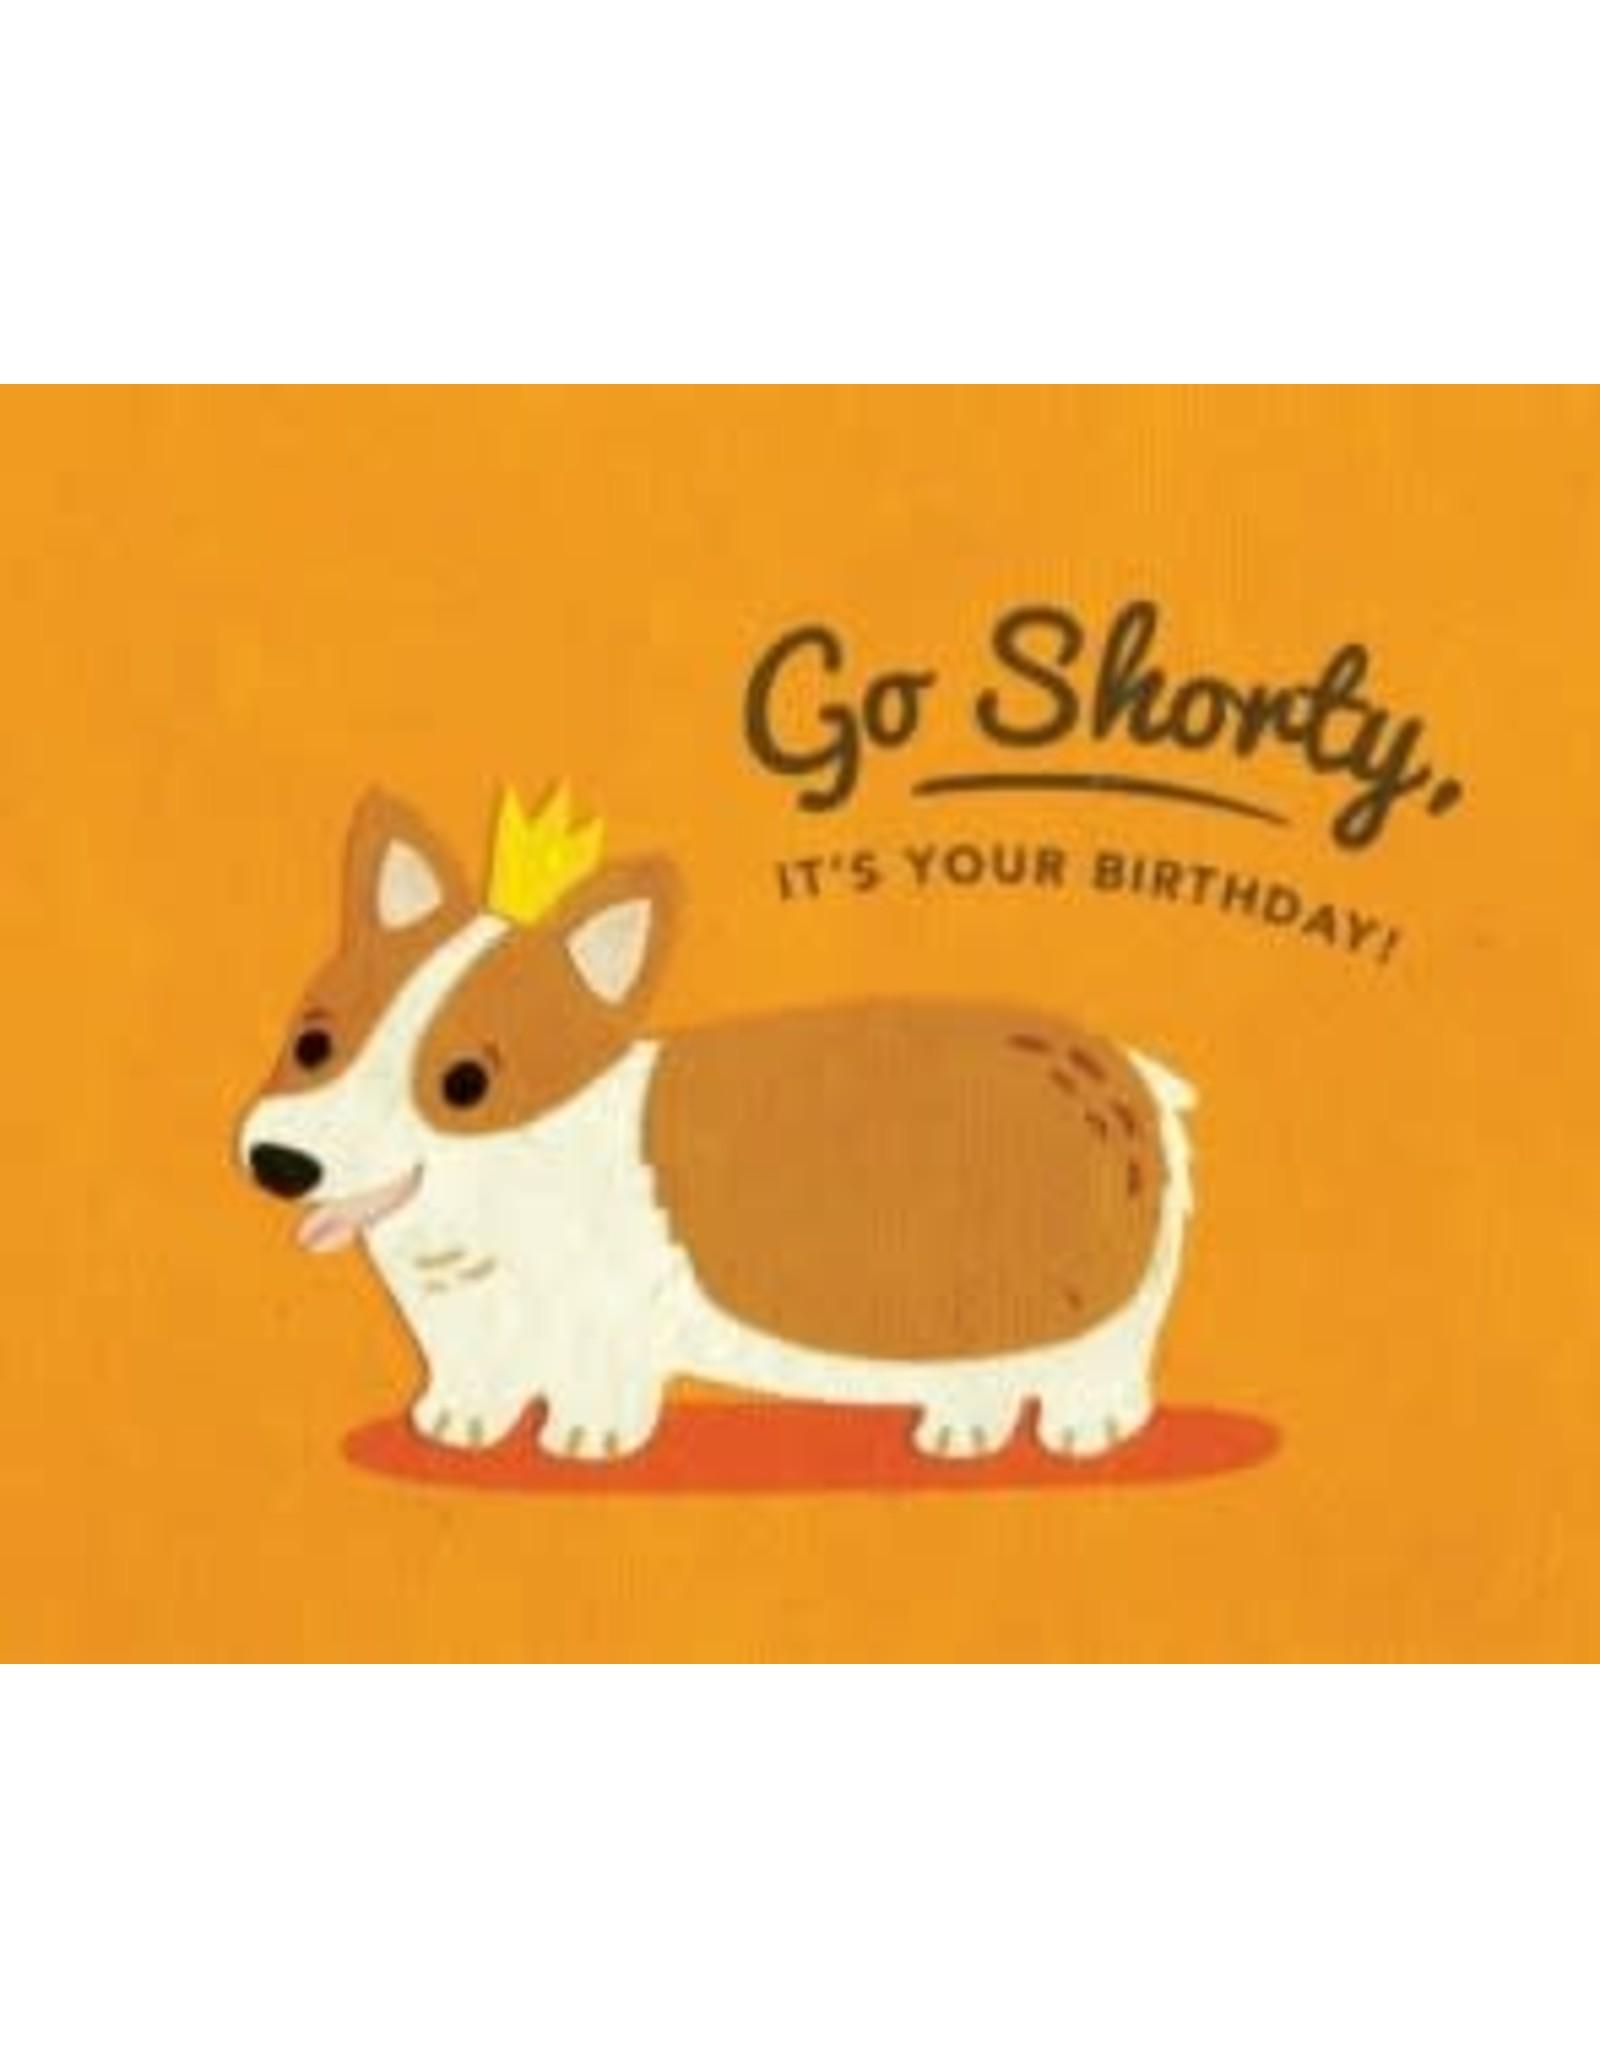 Corgi Shorty Birthday Greeting Card